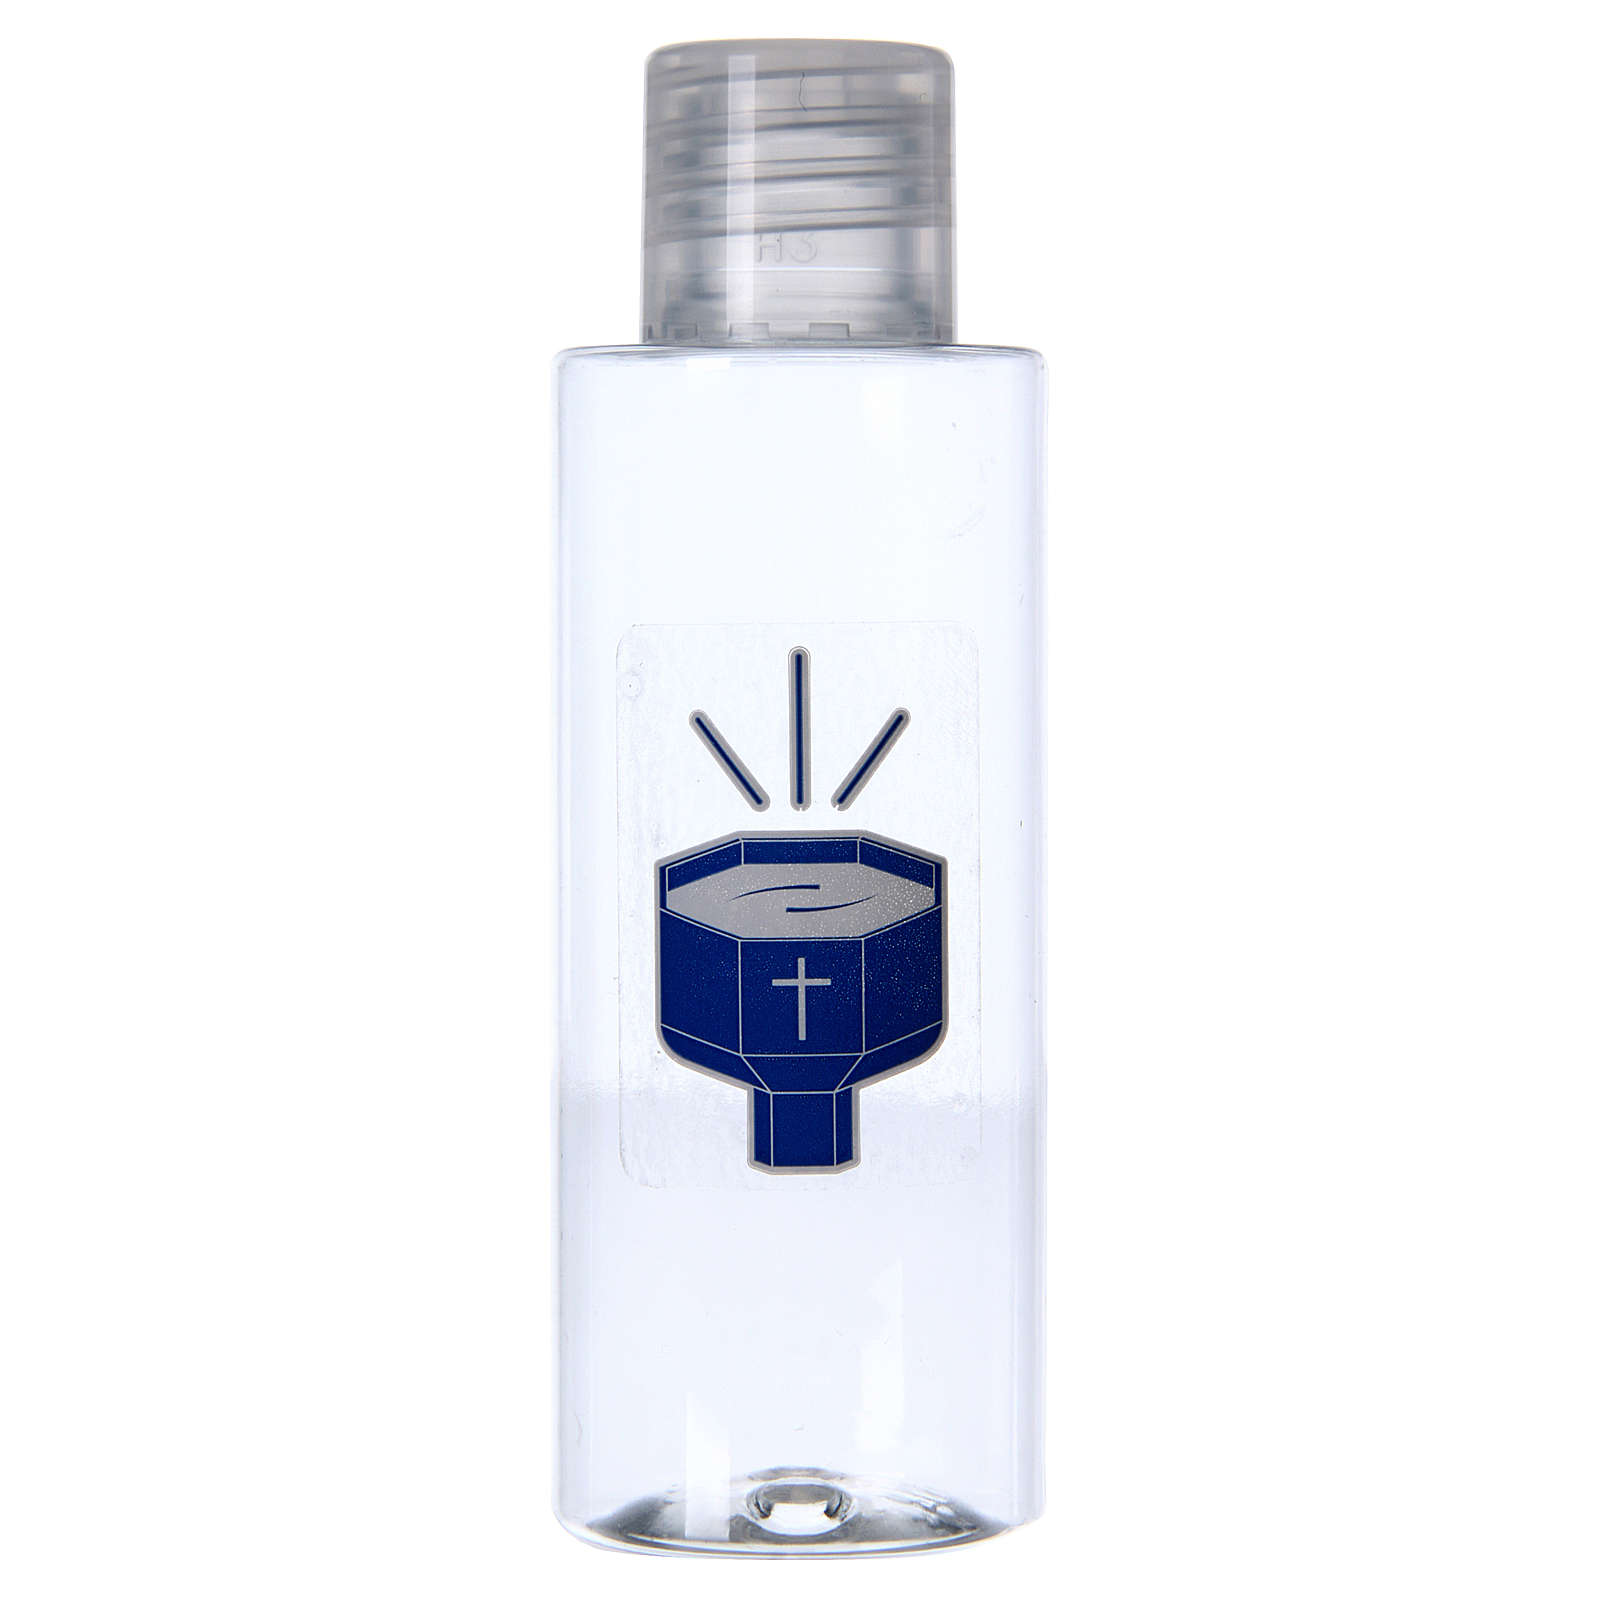 Botellas para agua bendita pila bautismal (caja 100 piezas) 3